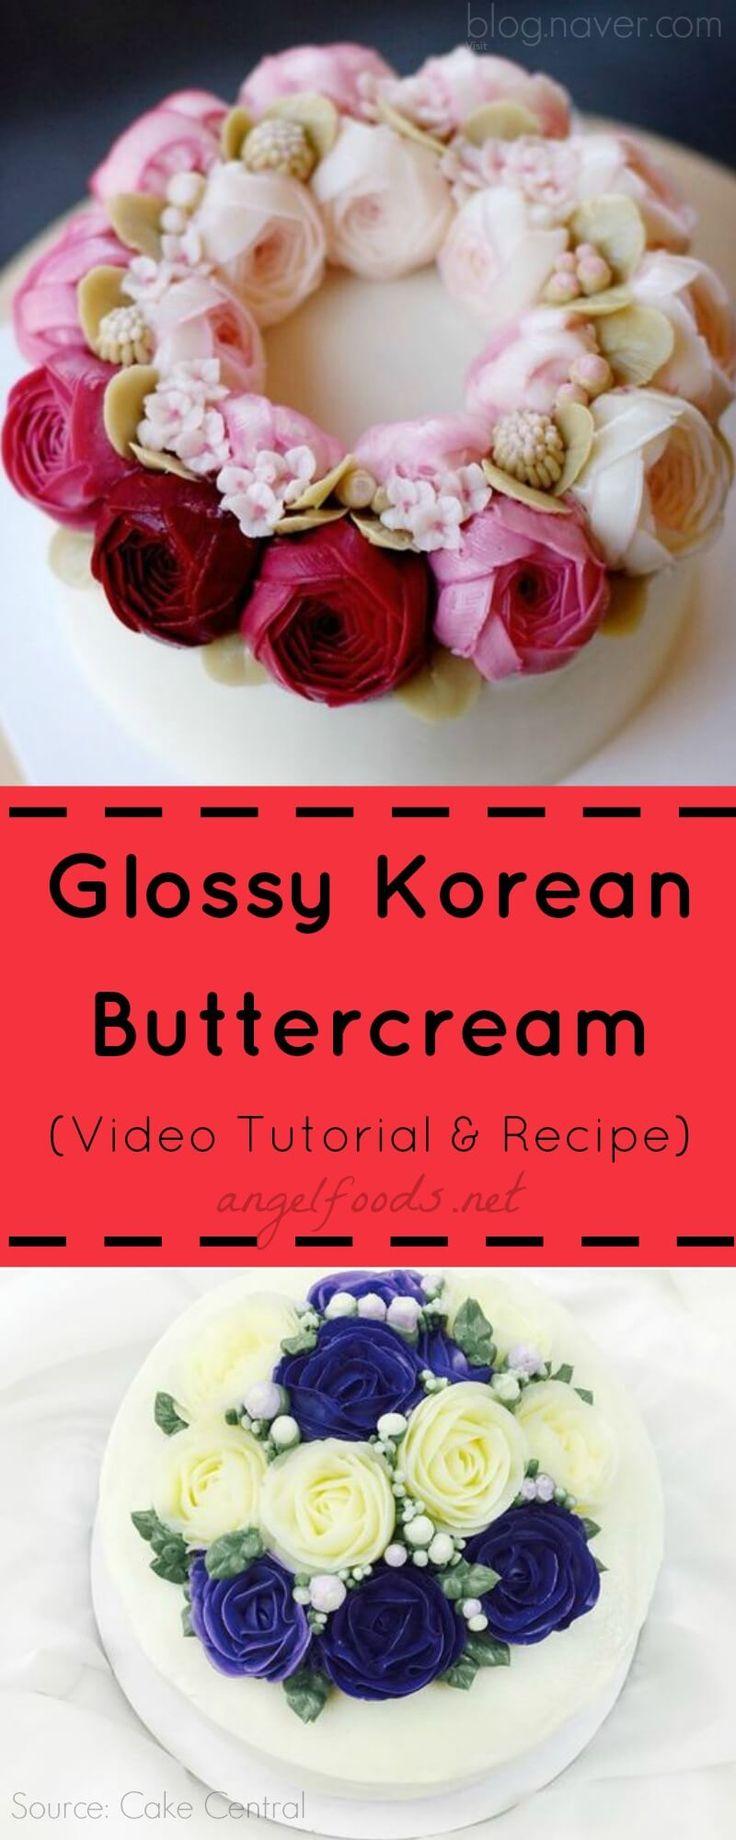 Brillante Coreano Buttercream (Video Tutorial & Recipe) |  Alimentos de ángel